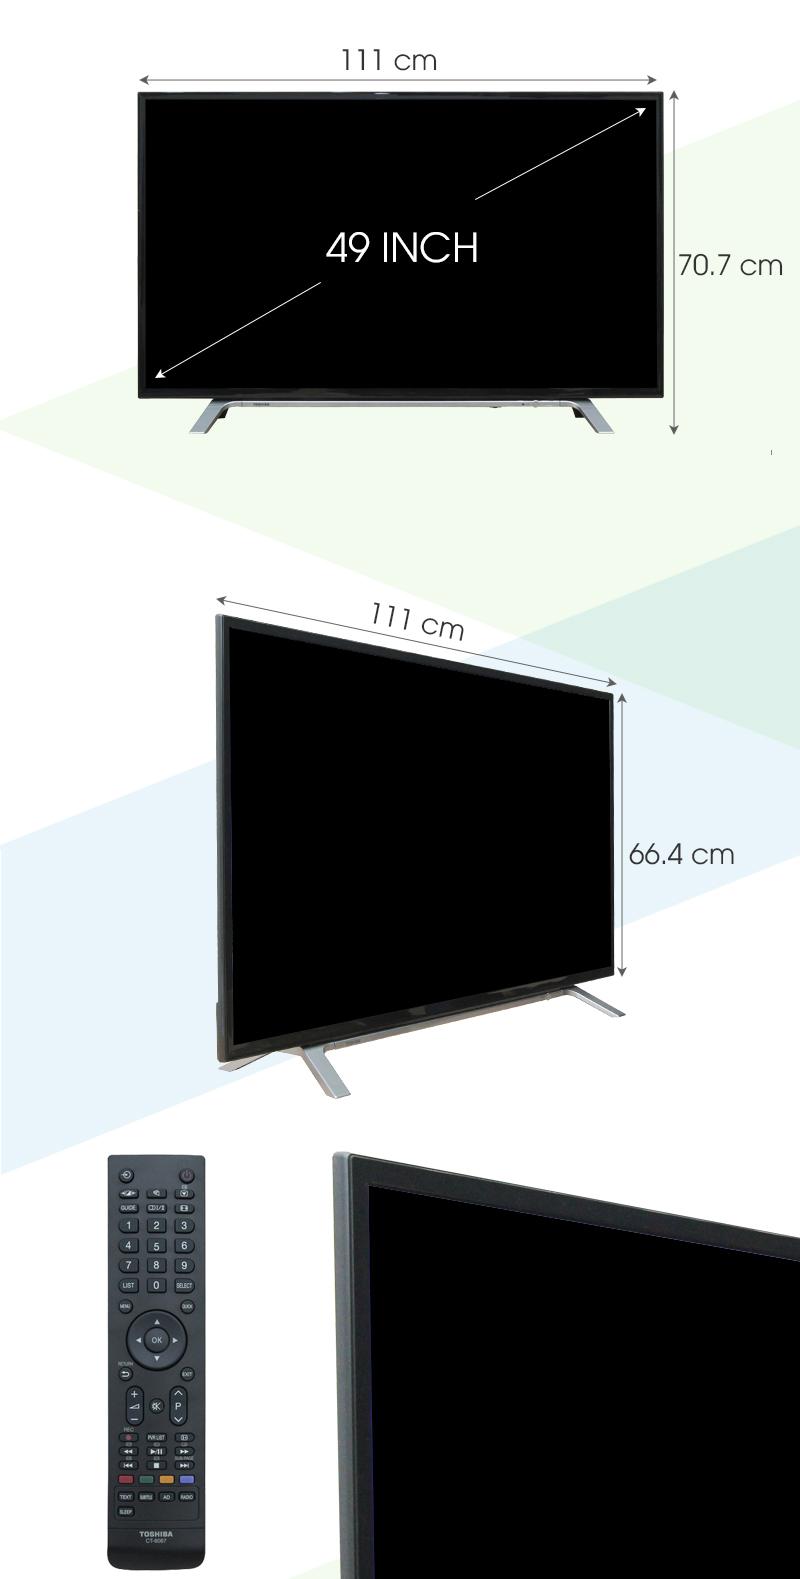 Tivi Toshiba 49 inch 49L3650 - Kích thức tivi